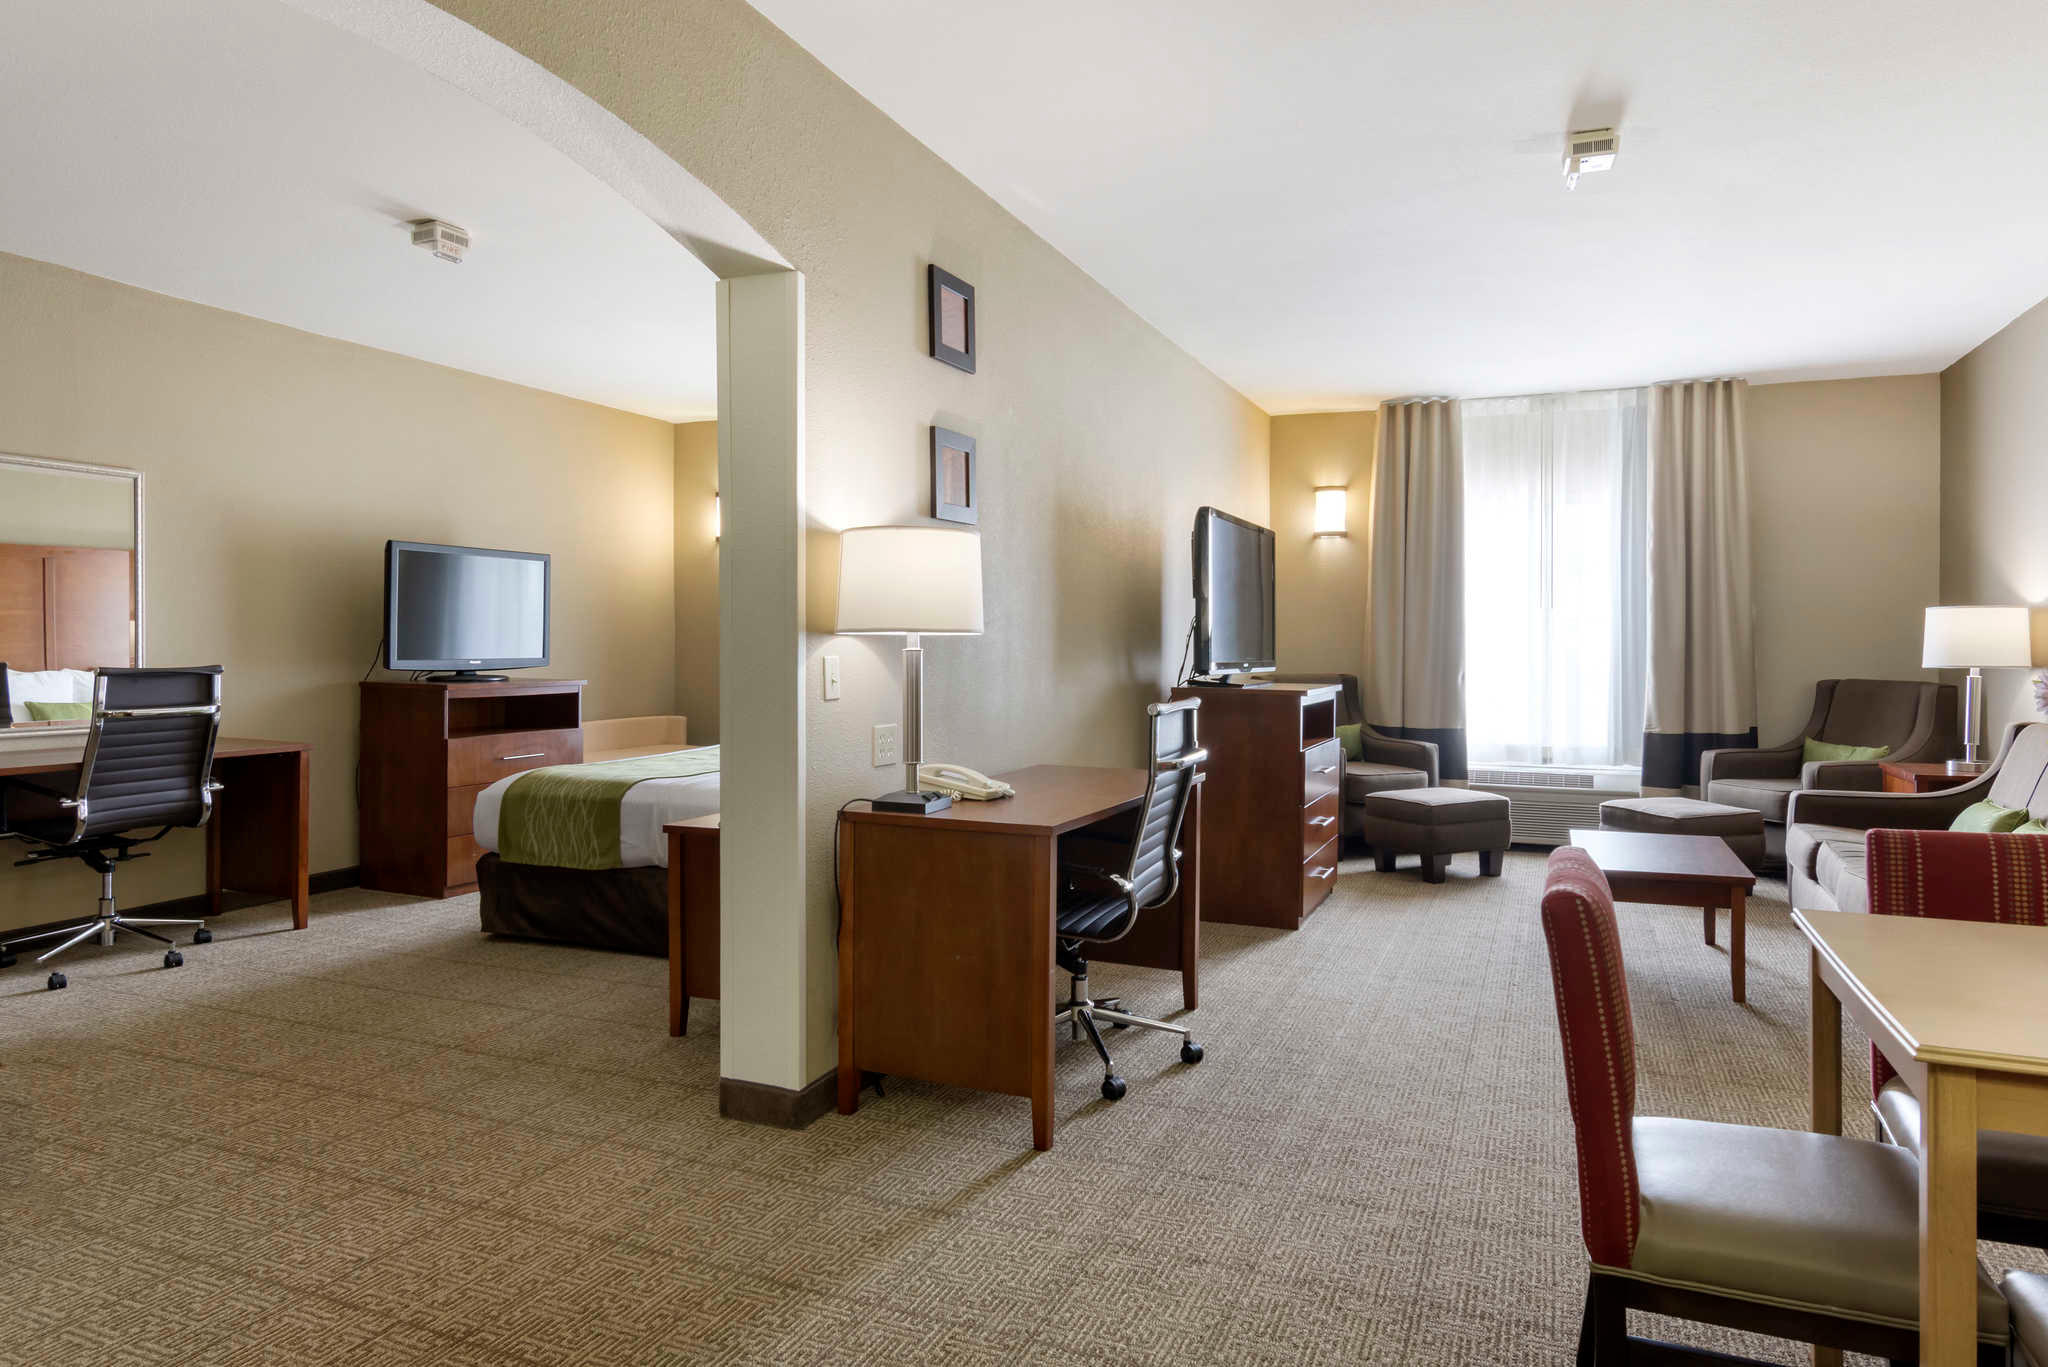 Comfort Inn & Suites Sacramento - University Area image 24